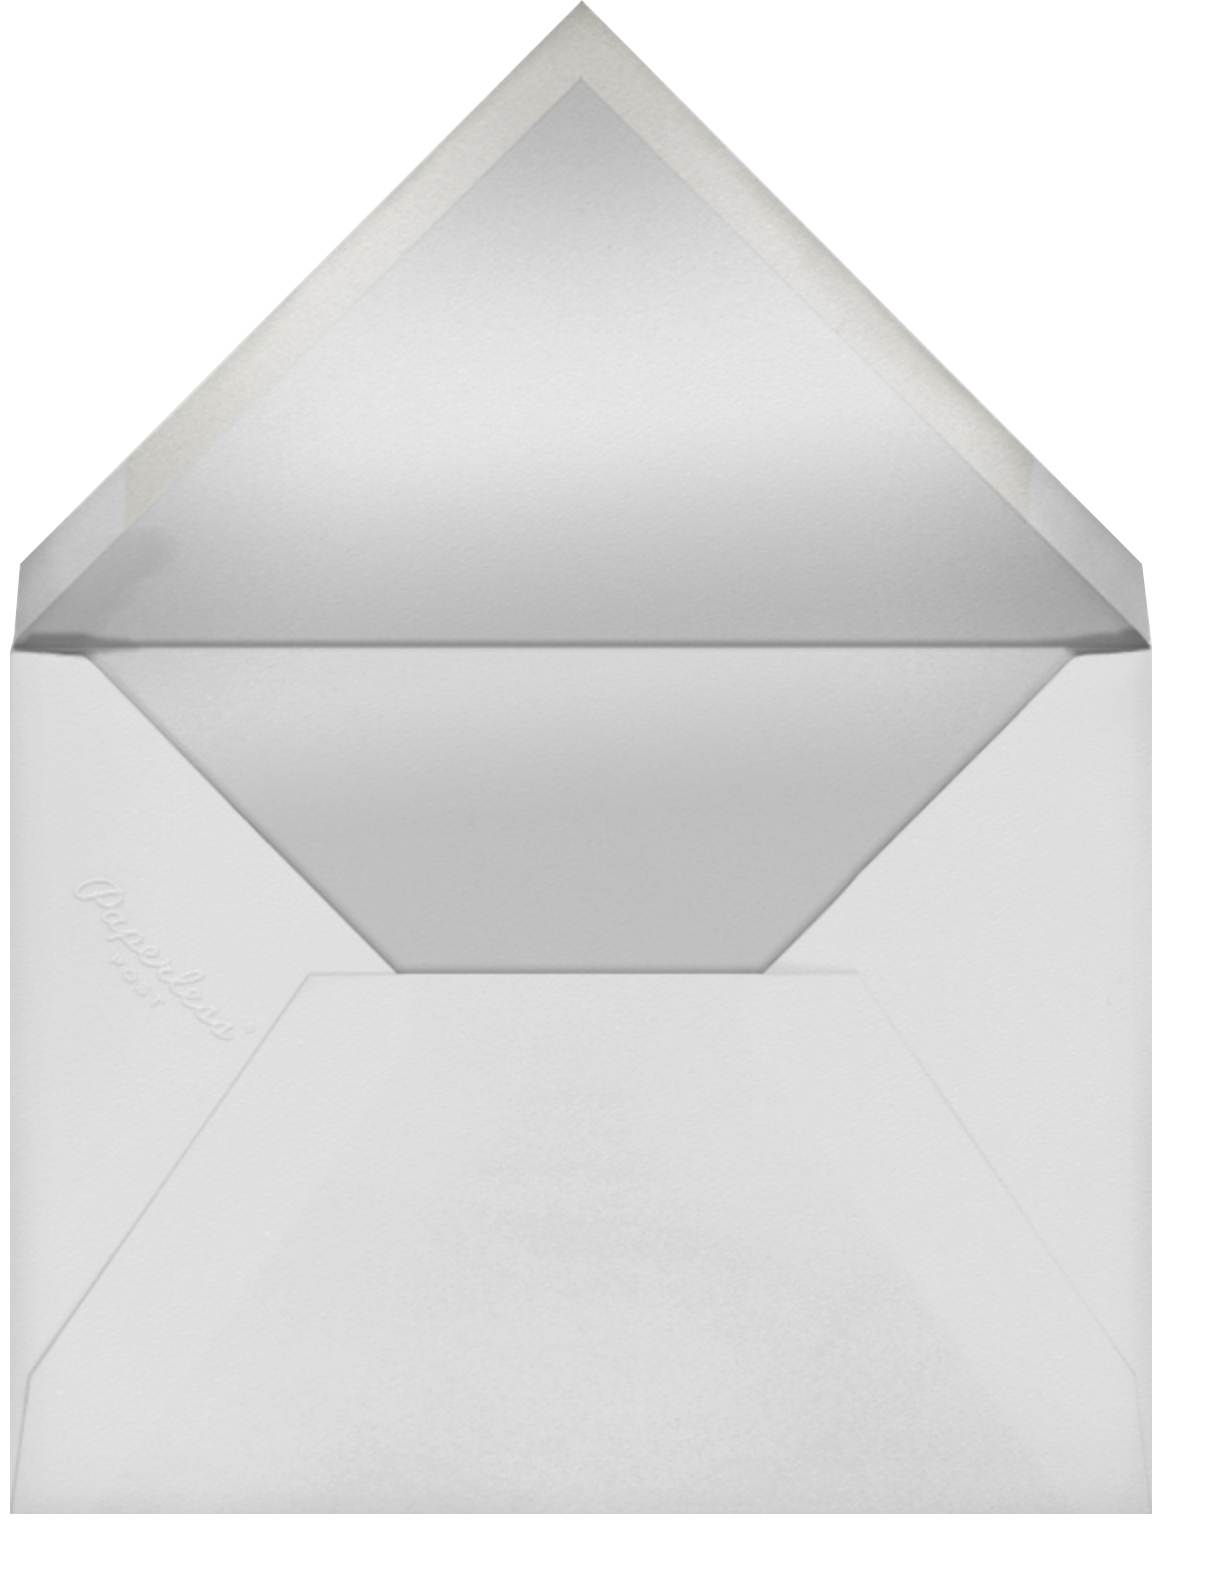 Kona Floral (Program) - Celadon - Rifle Paper Co. - Menus and programs - envelope back